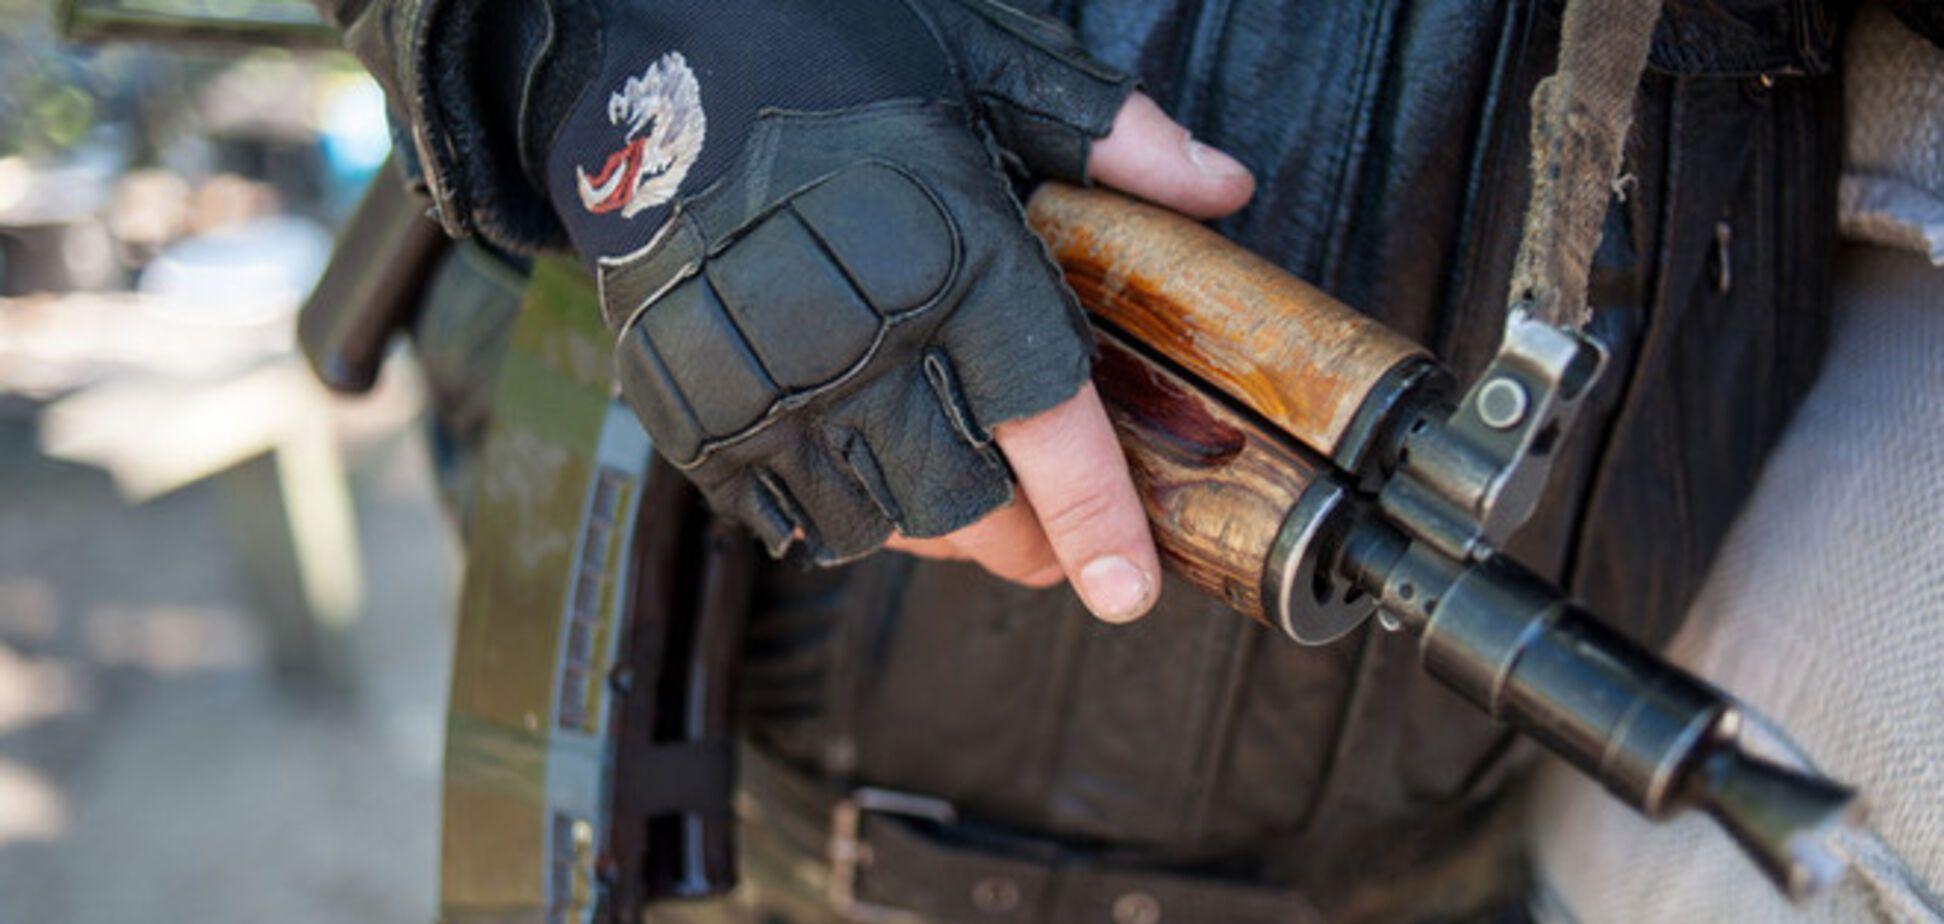 Сепаратисты захватили в Краматорске завод - Тымчук